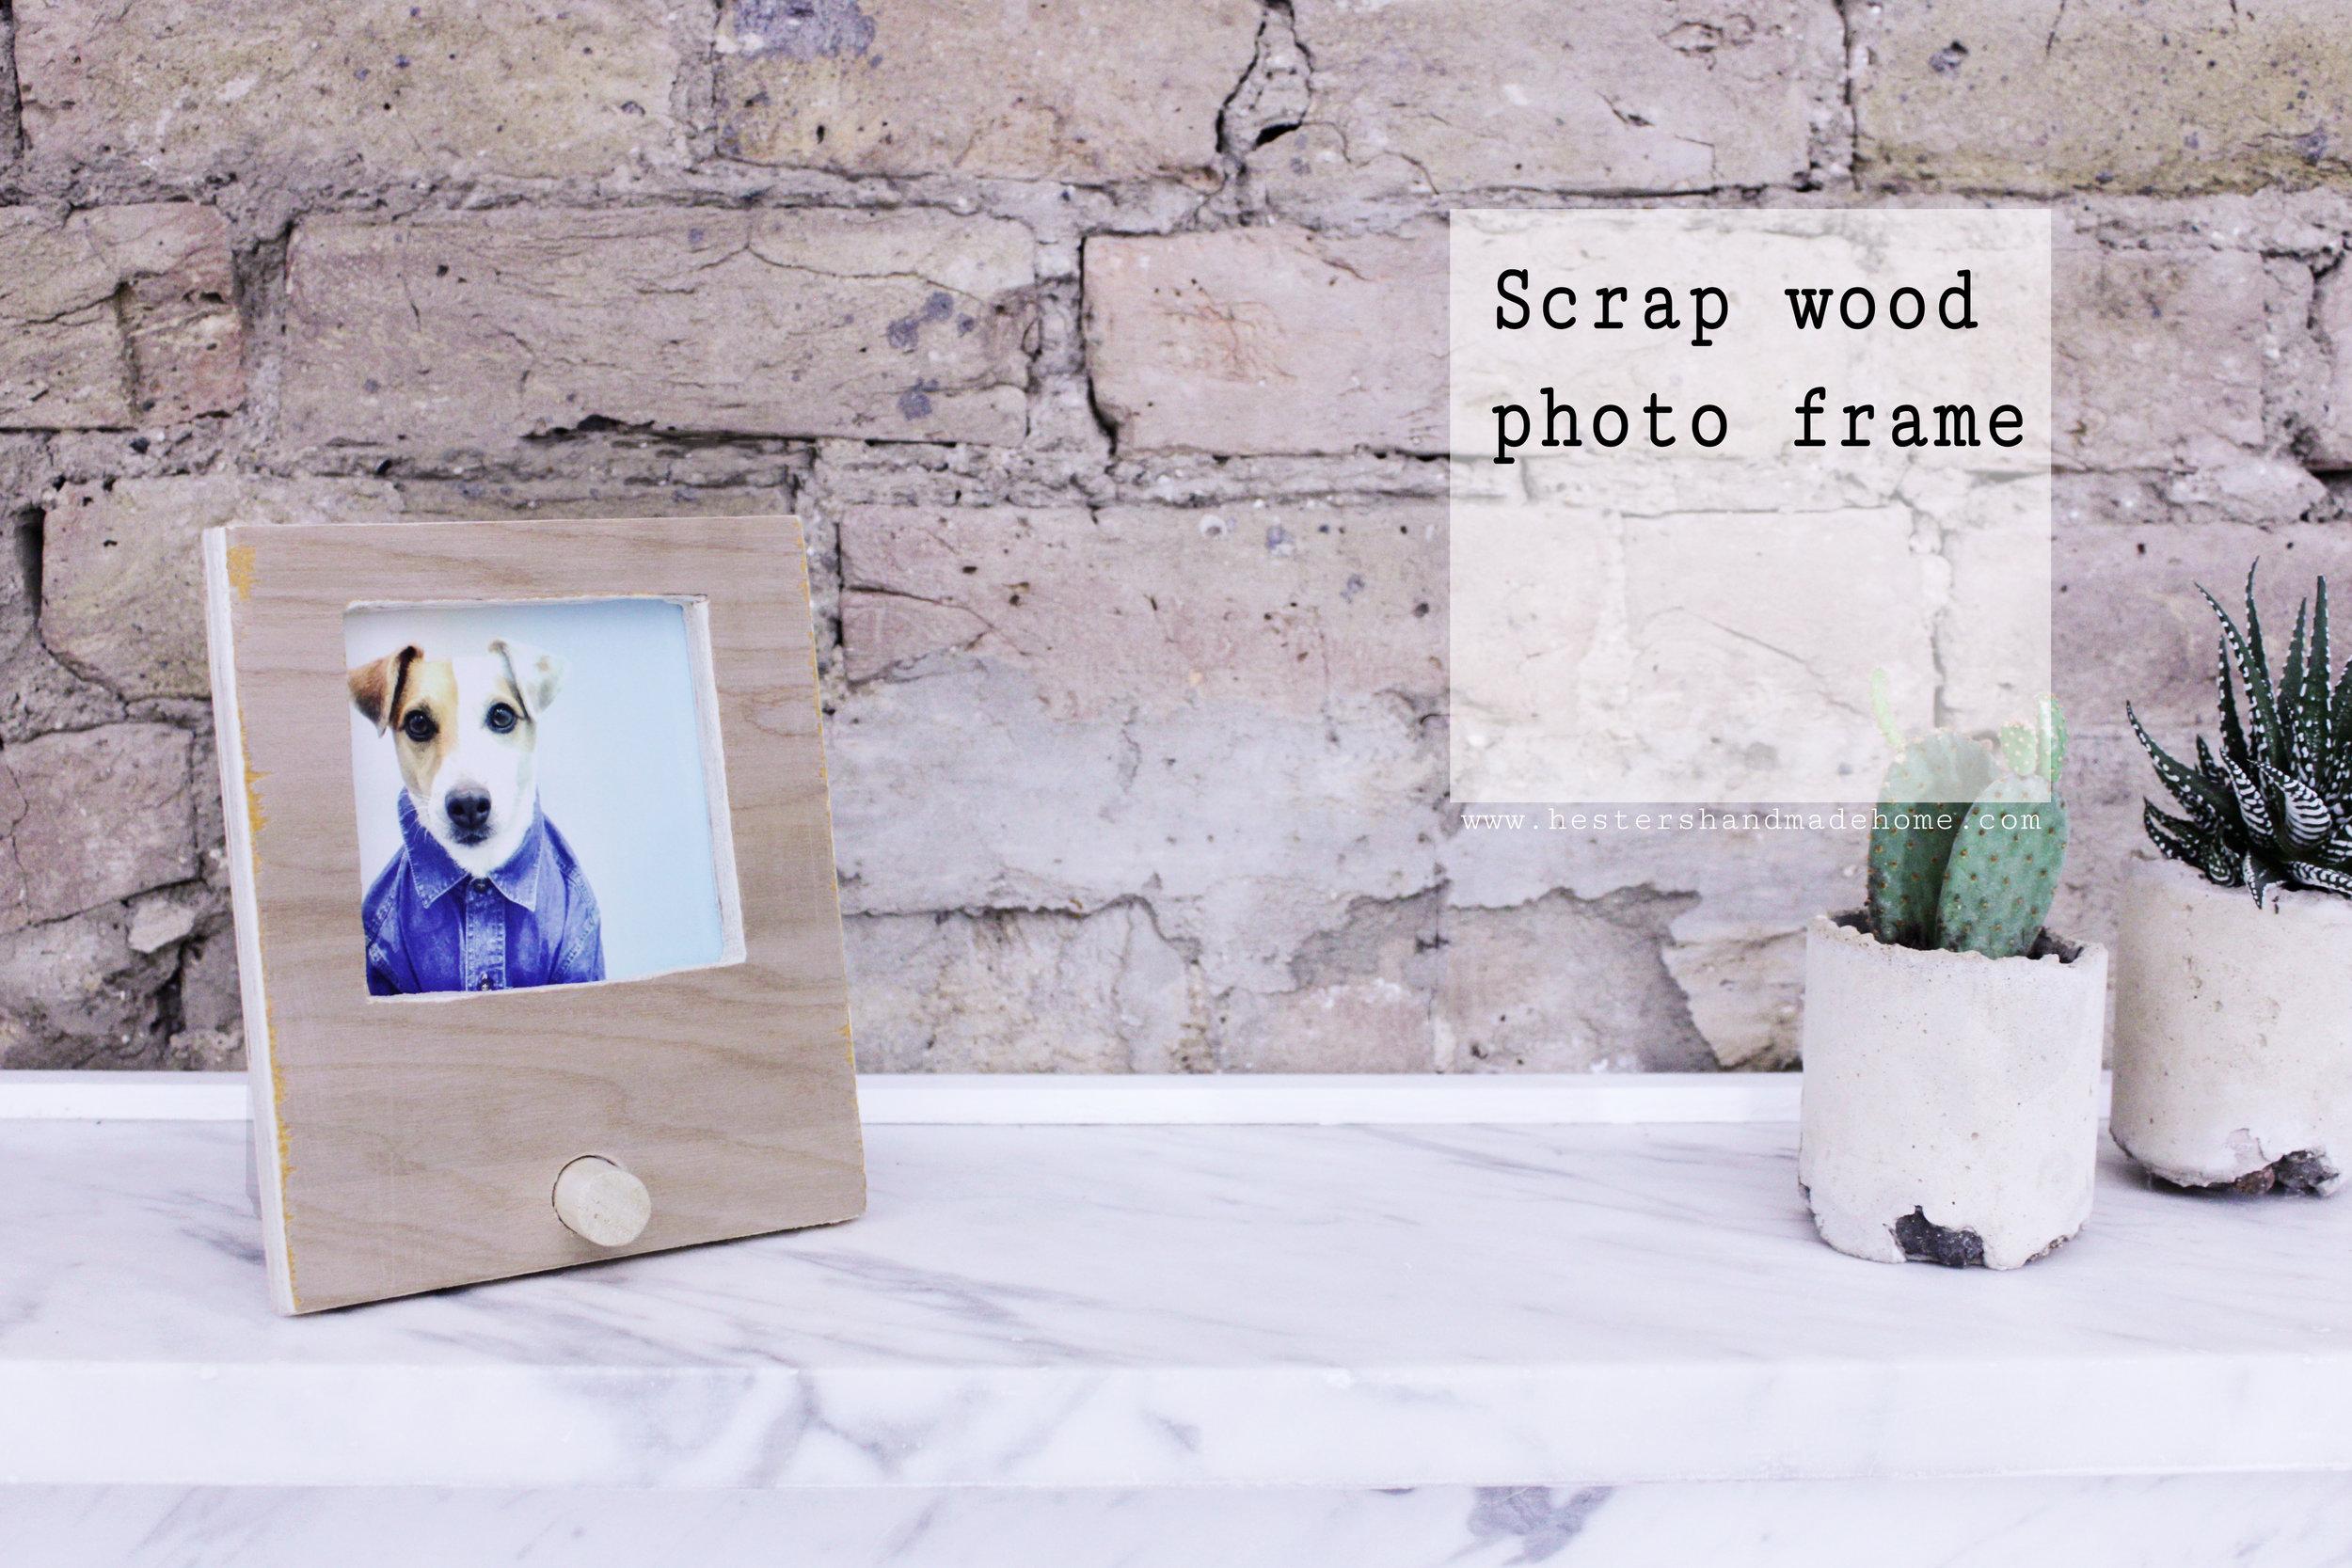 scrapwood photo frame tutorial, great homemade gift for Christmas